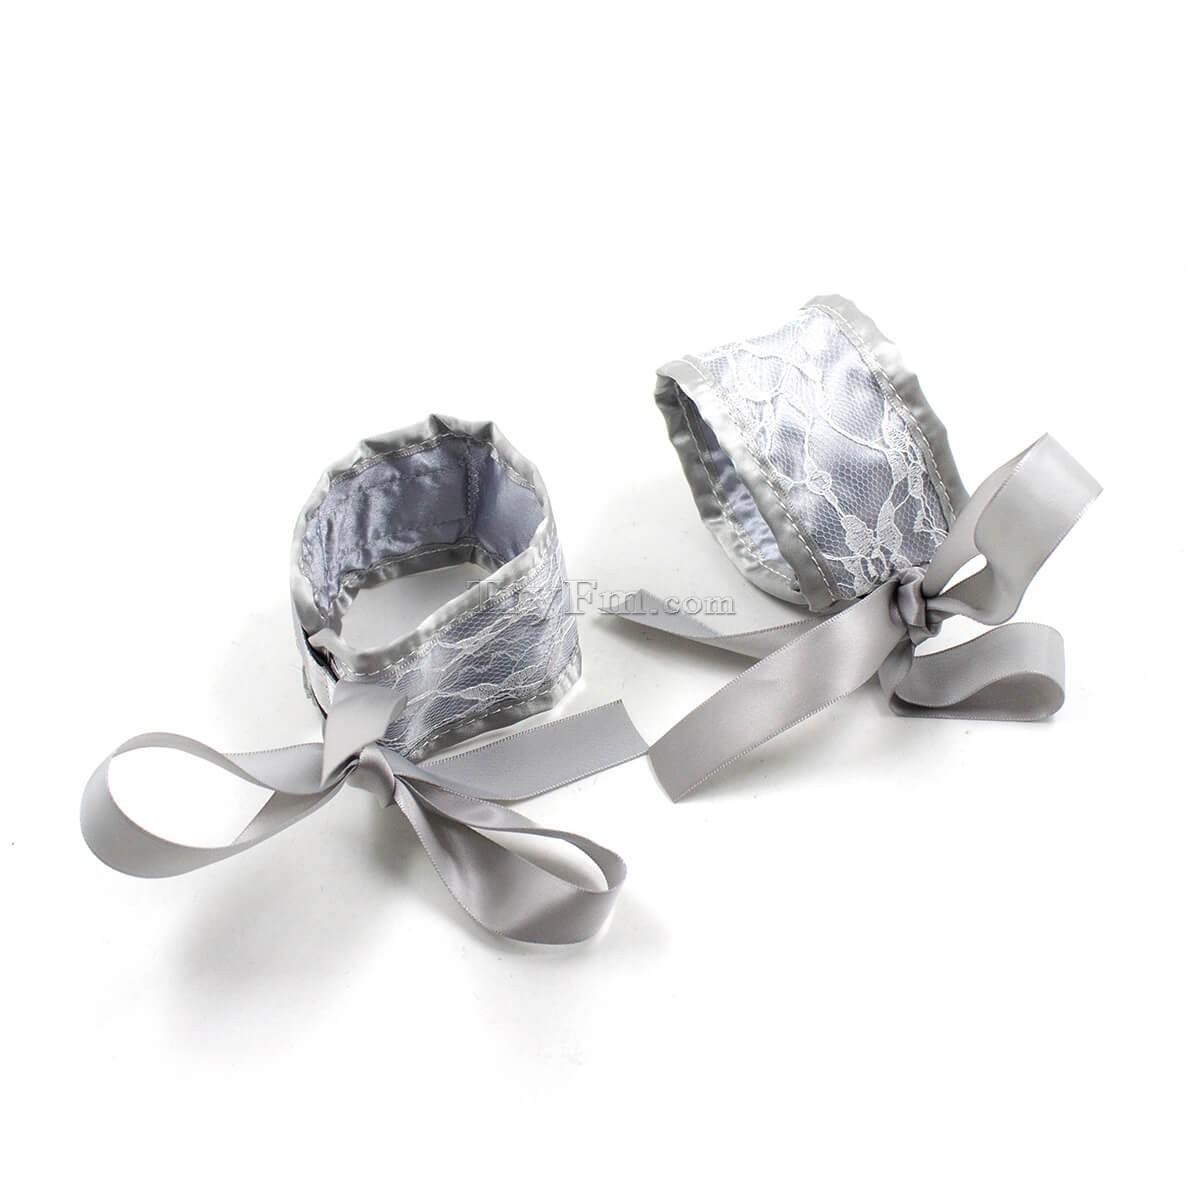 3-White-lace-silky-set5.jpg